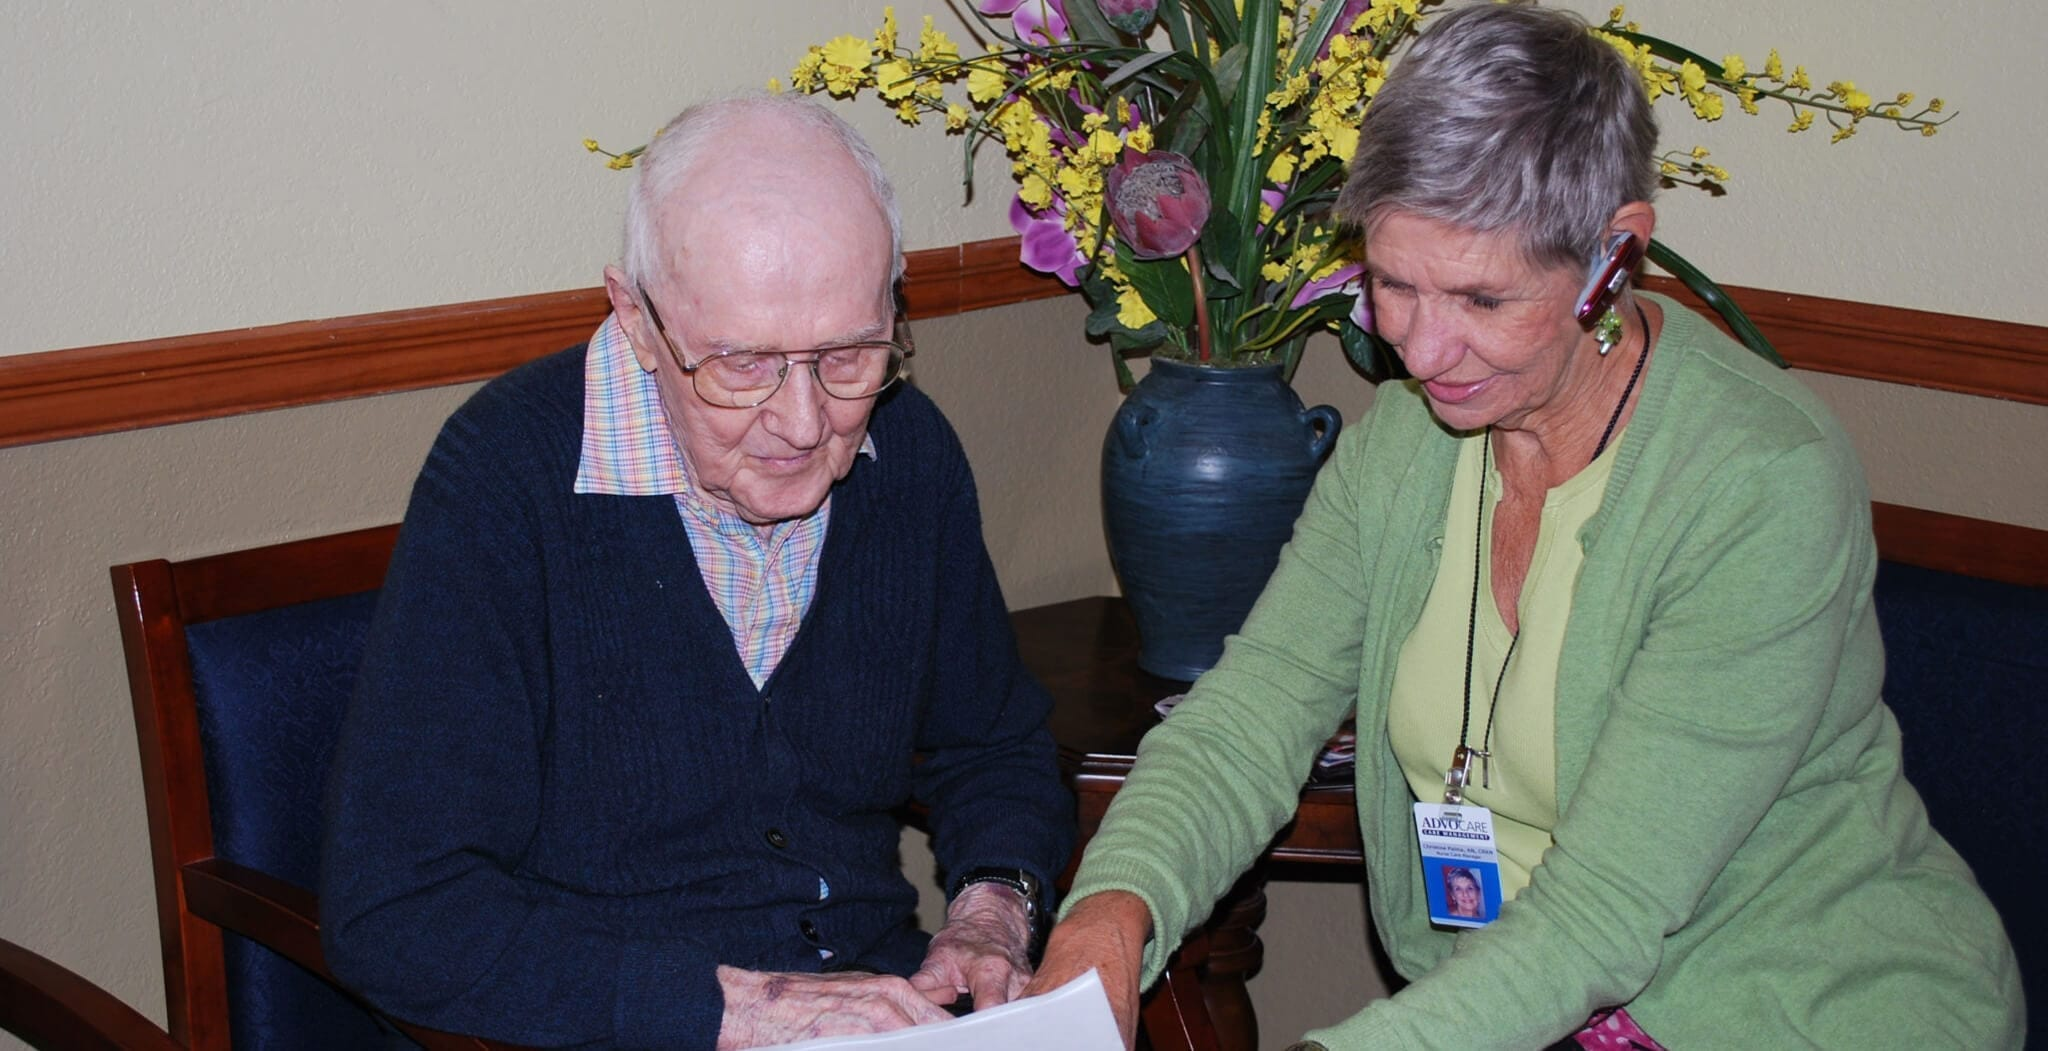 Caregiver reading a document for patient